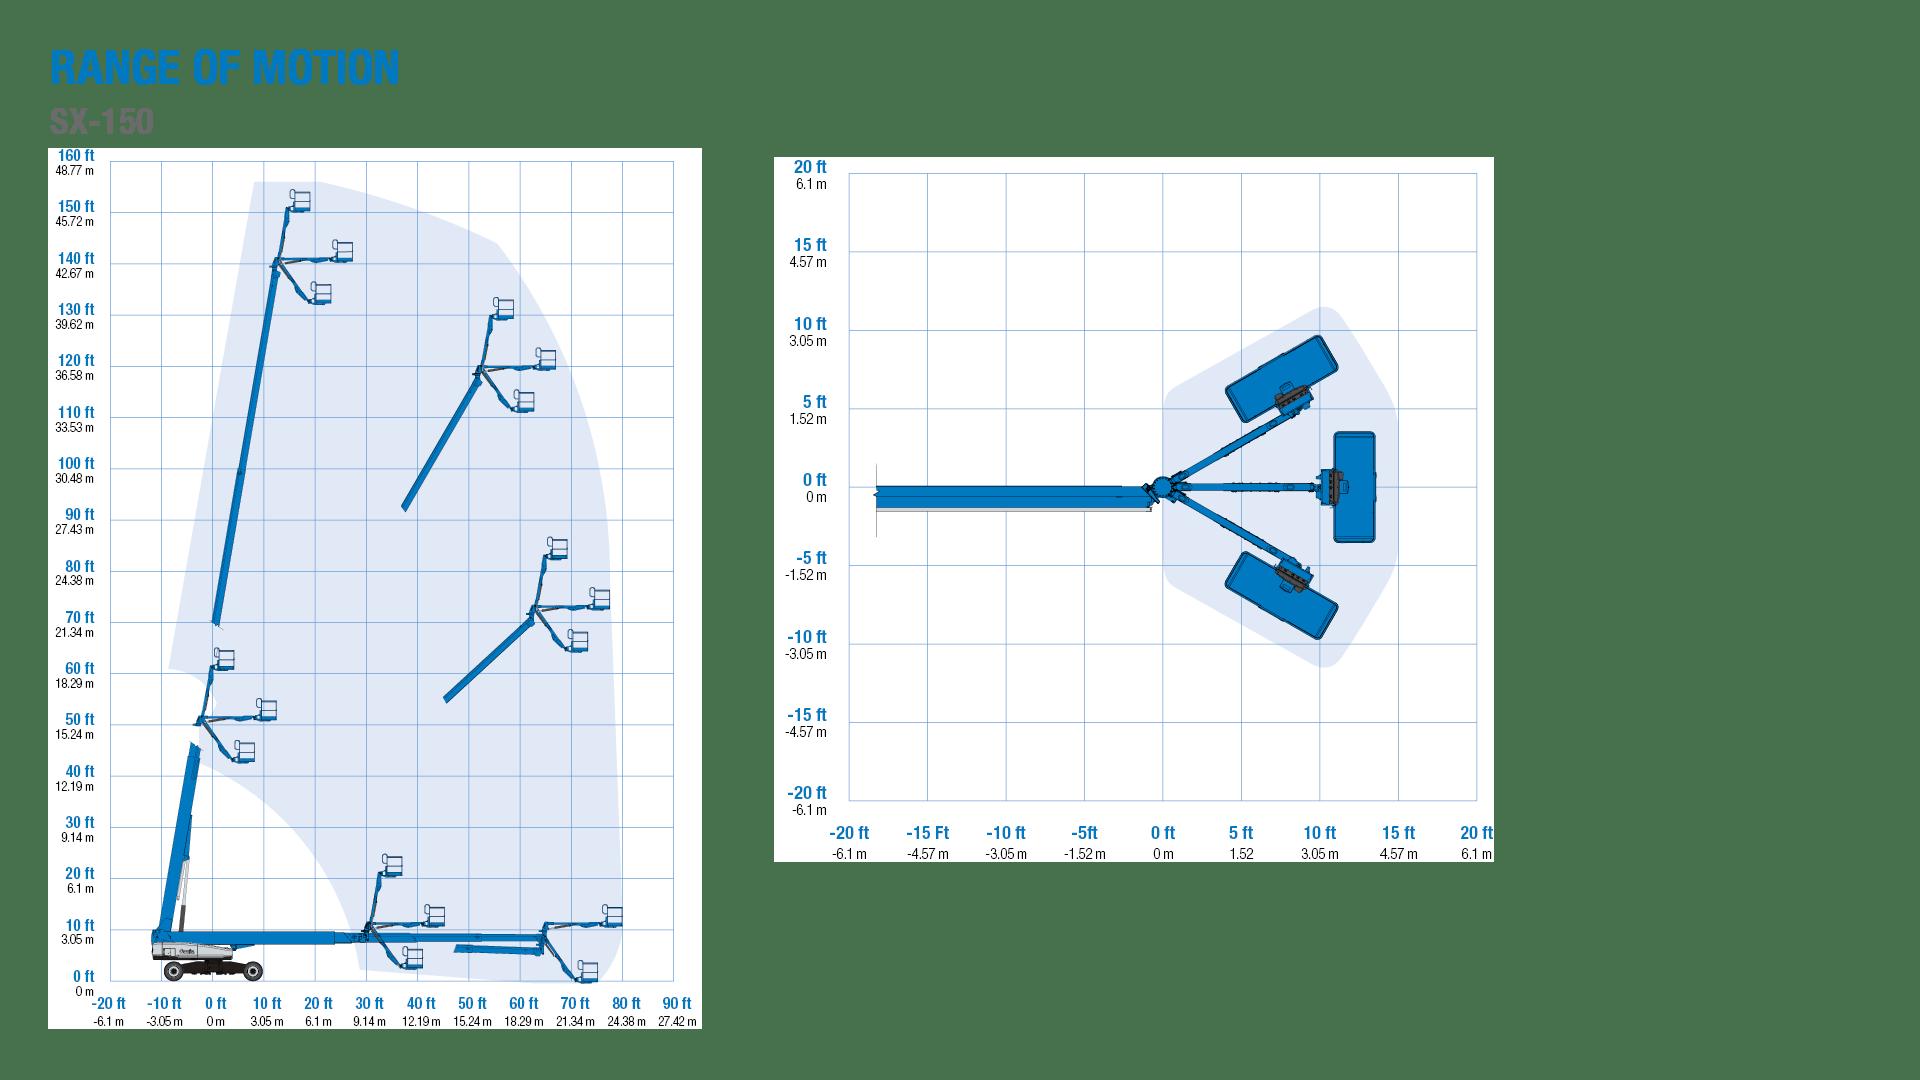 taylor dunn wiring diagram efcaviation com taylor dunn wiring on taylor dunn accelerator  [ 1920 x 1080 Pixel ]